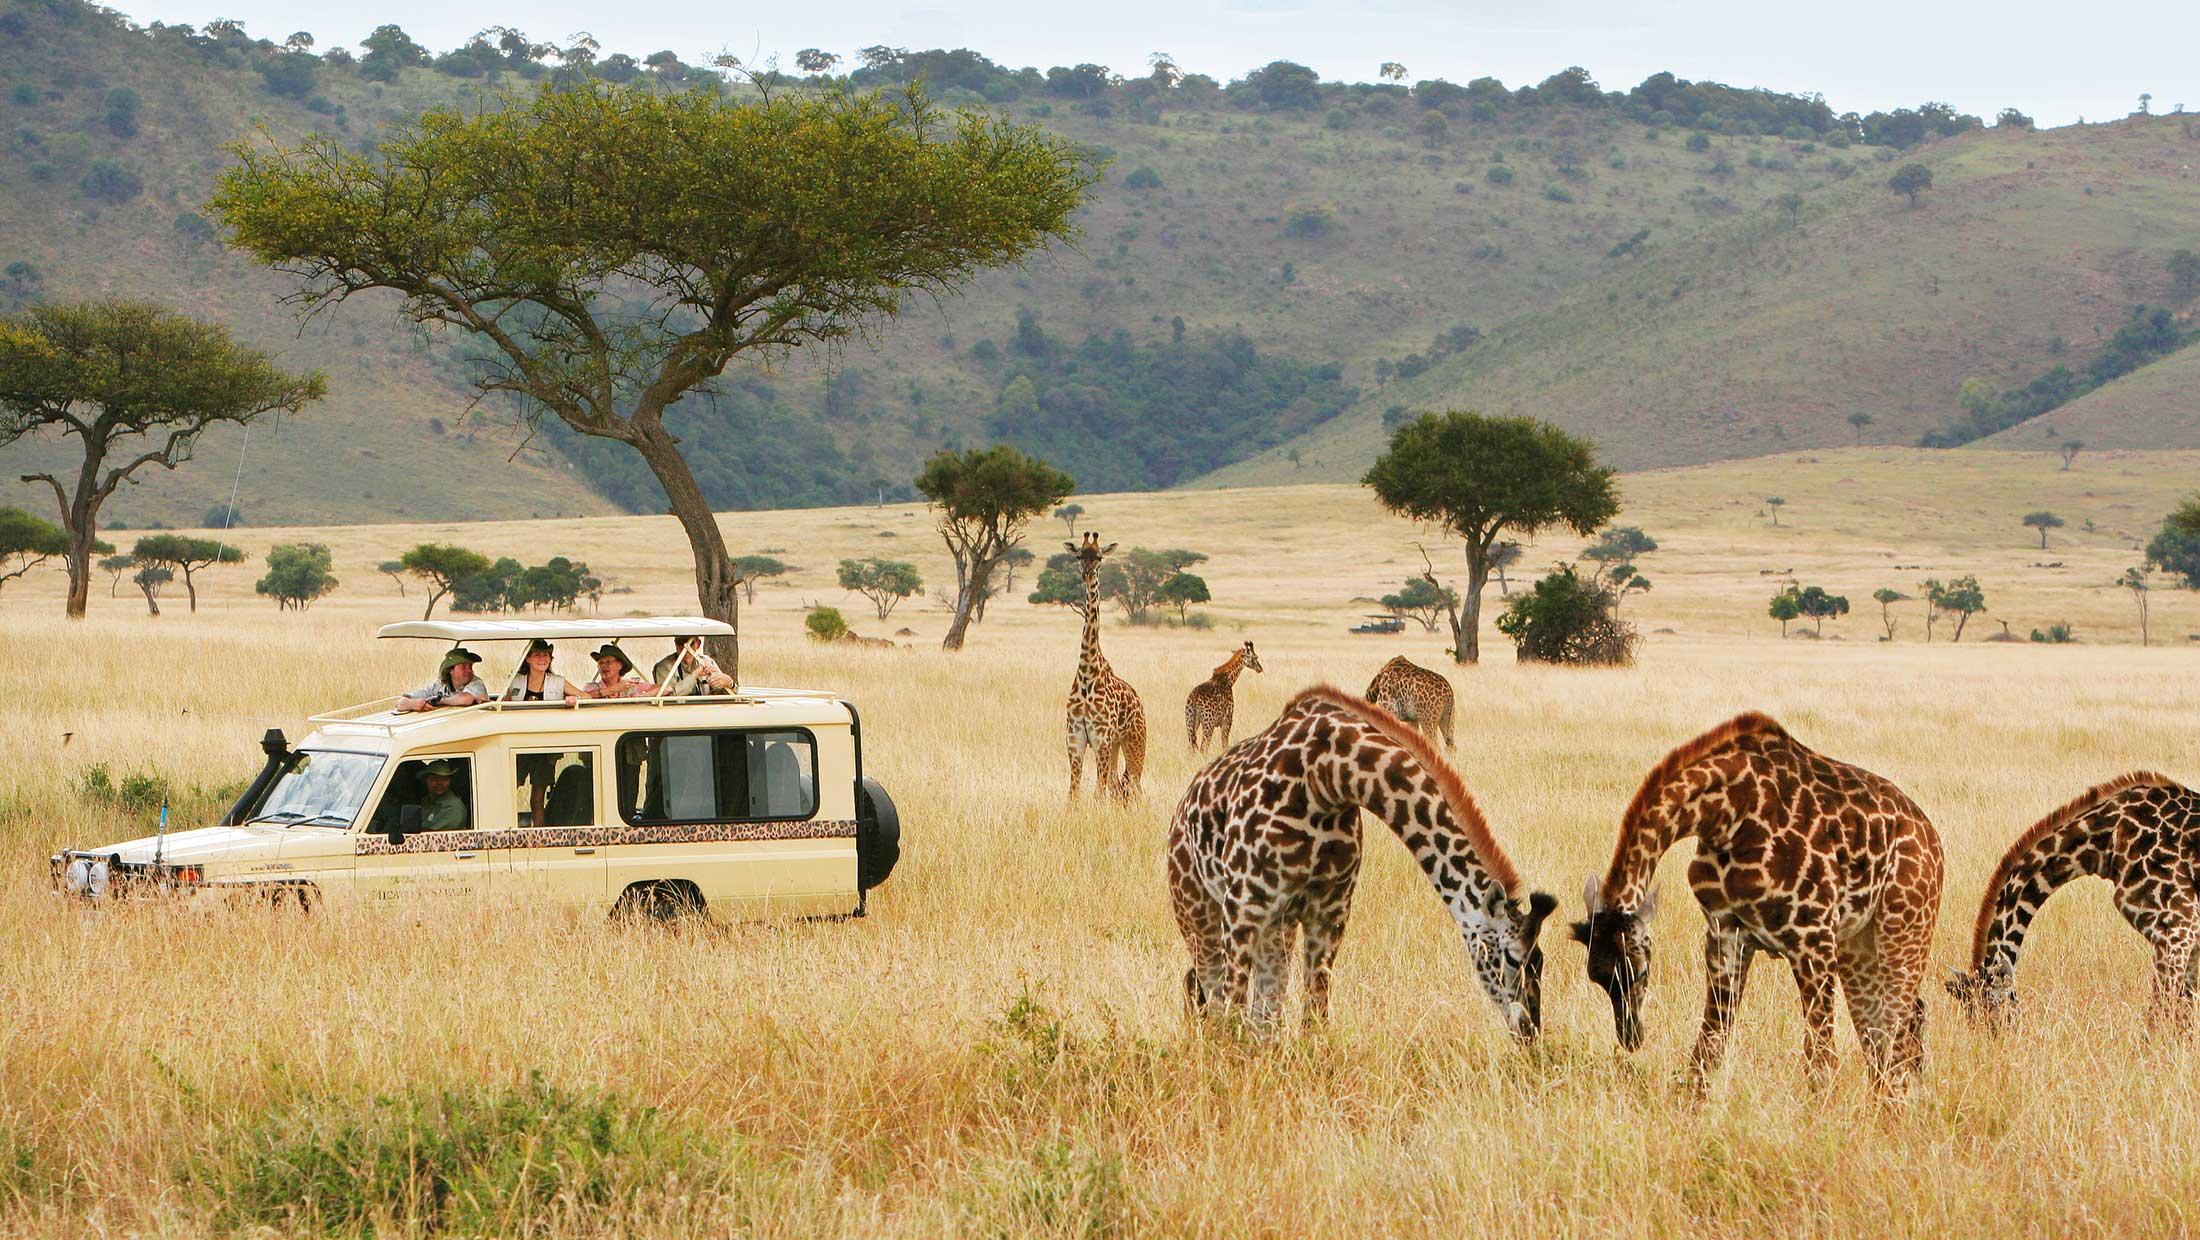 People having fun time with Micato Safari while watching Group of Giraffe